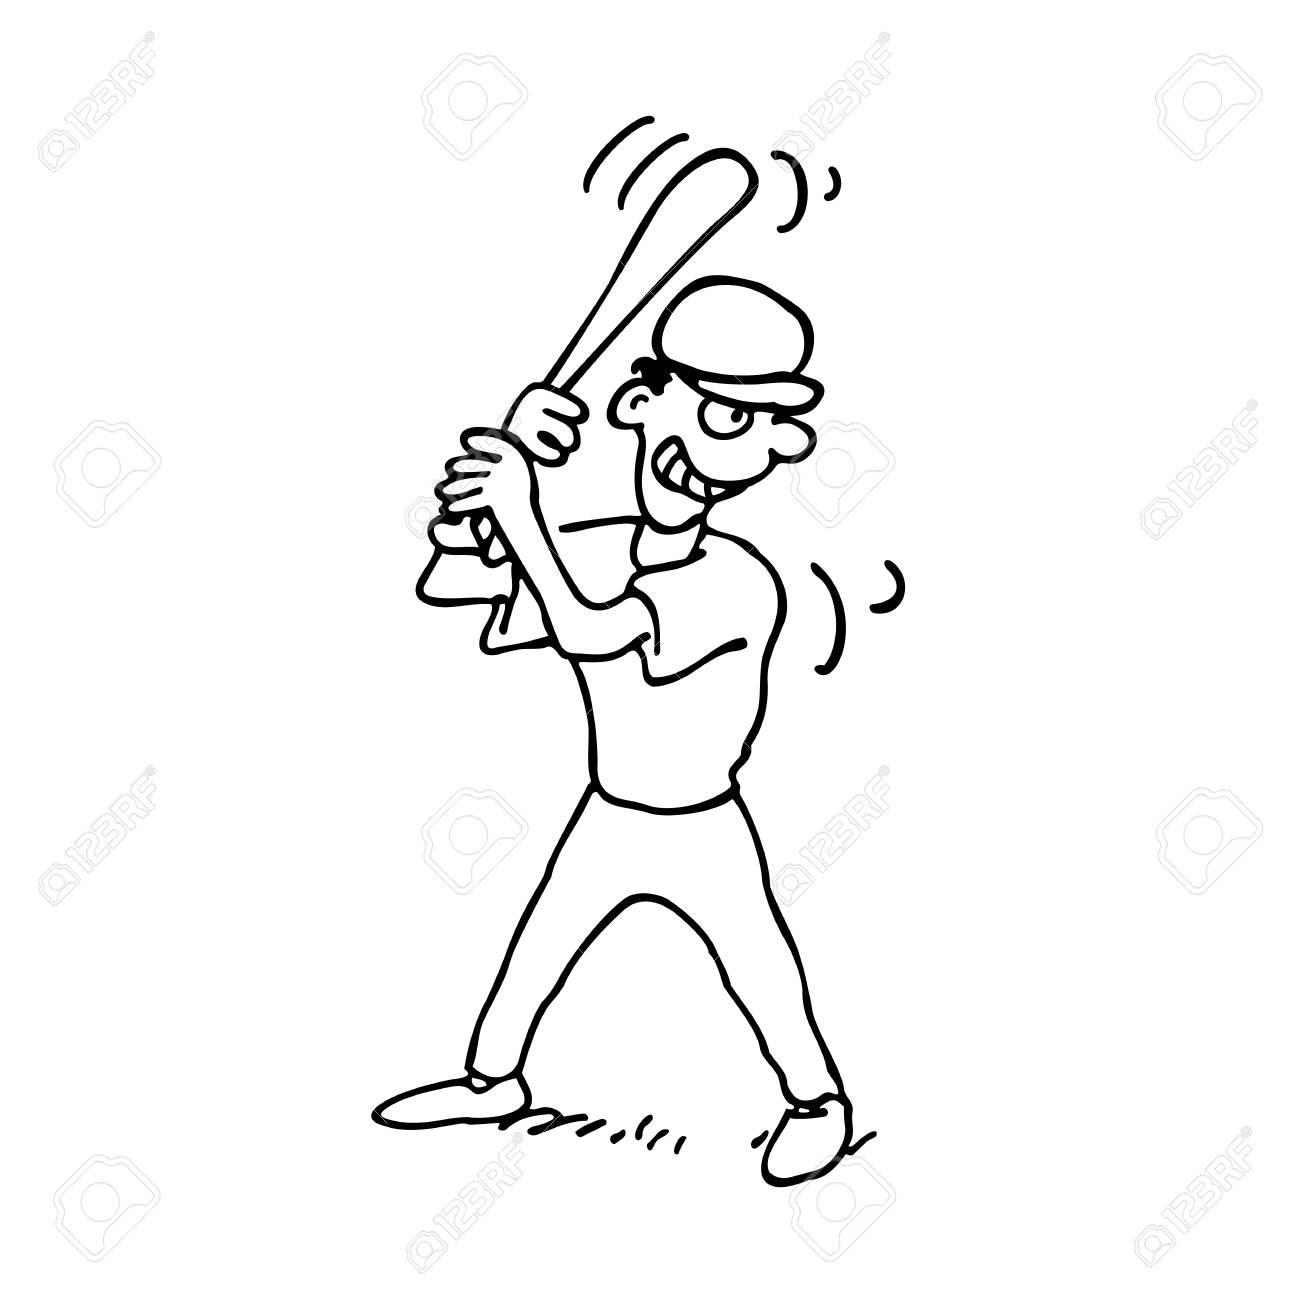 baseball players outlined cartoon on a white background vector rh 123rf com baseball art vector baseball glove vector art